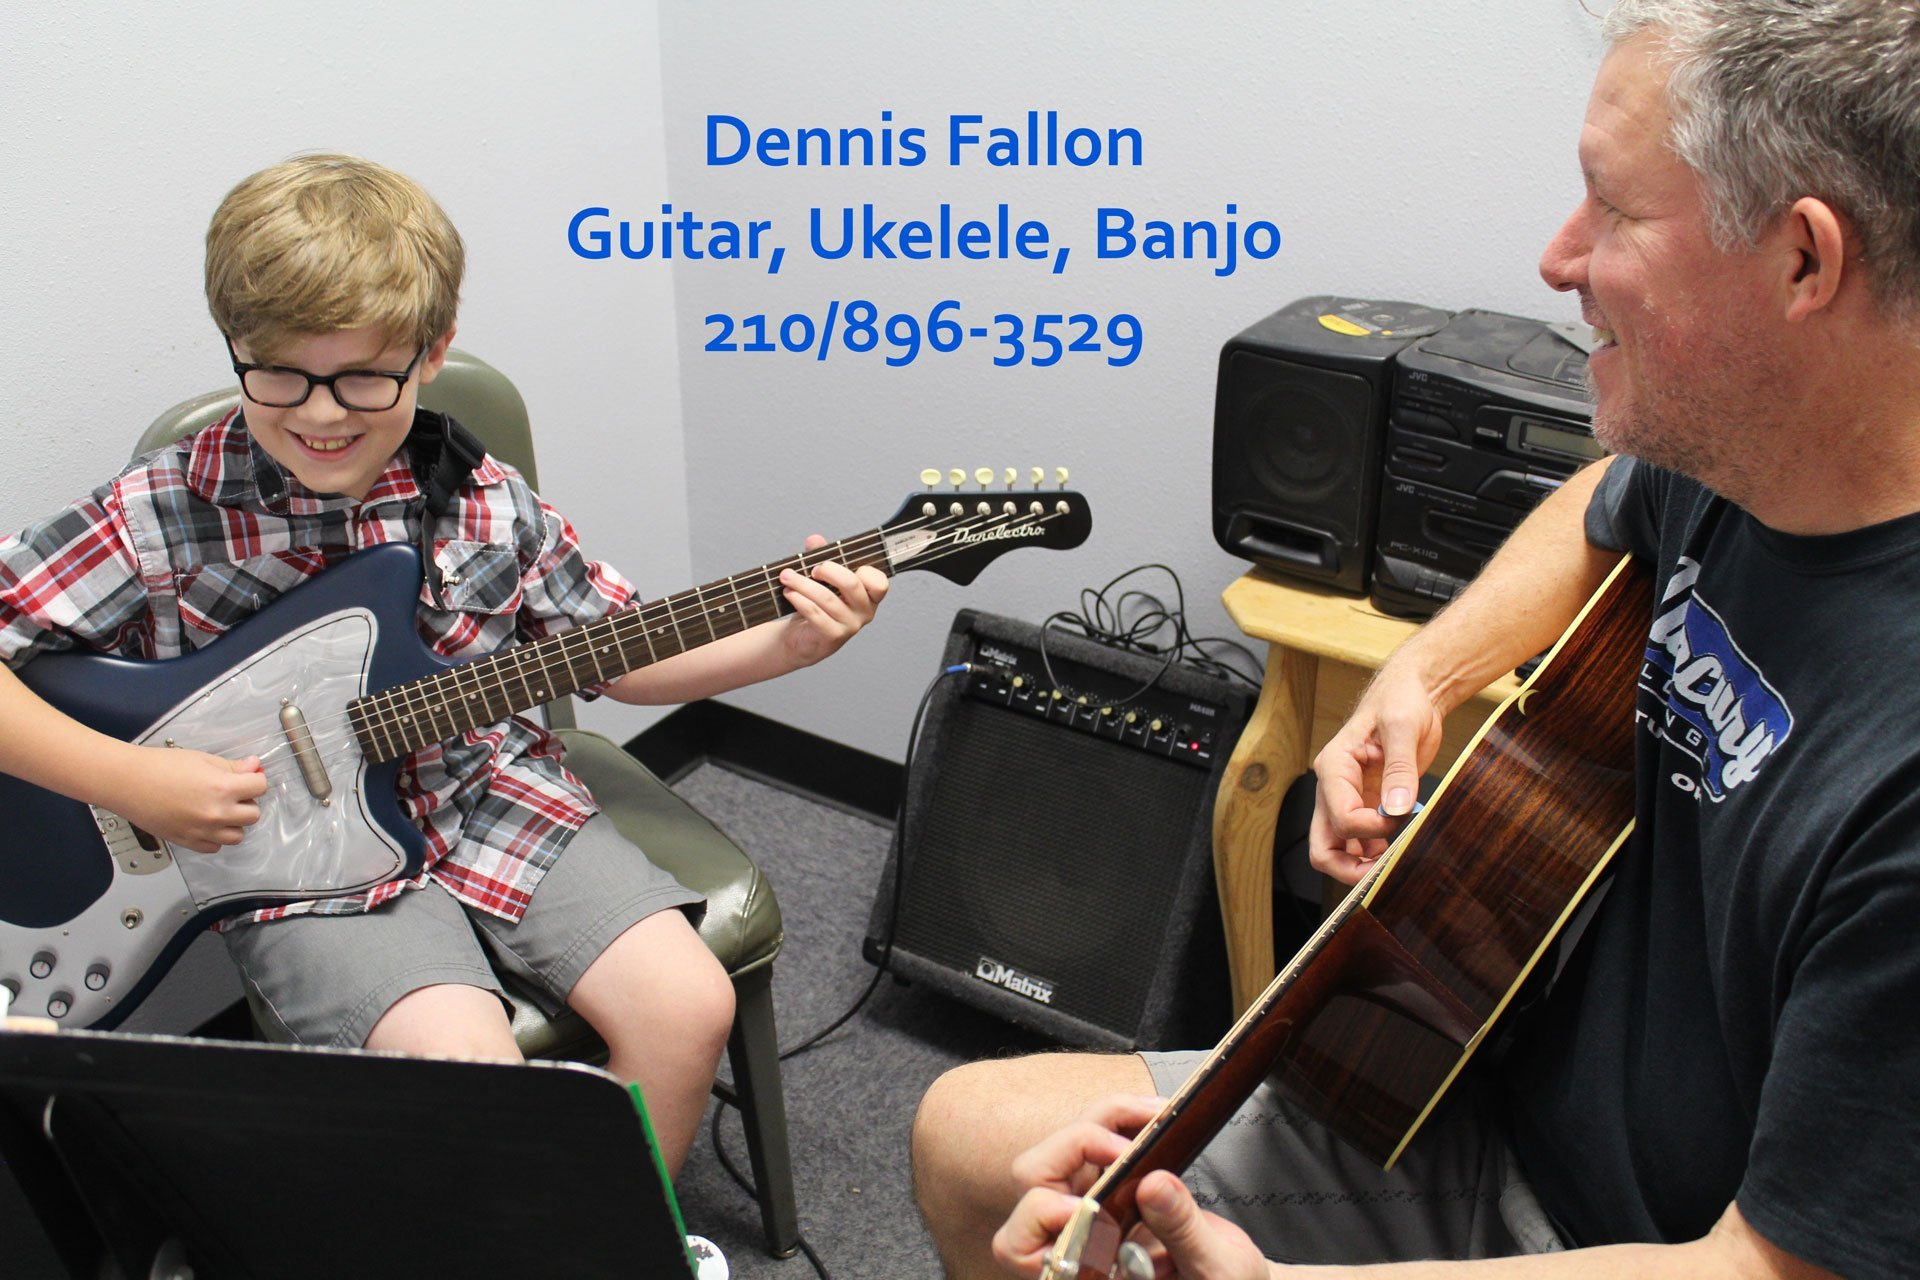 Dennis Fallon - Guitar, Ukelele Lessons